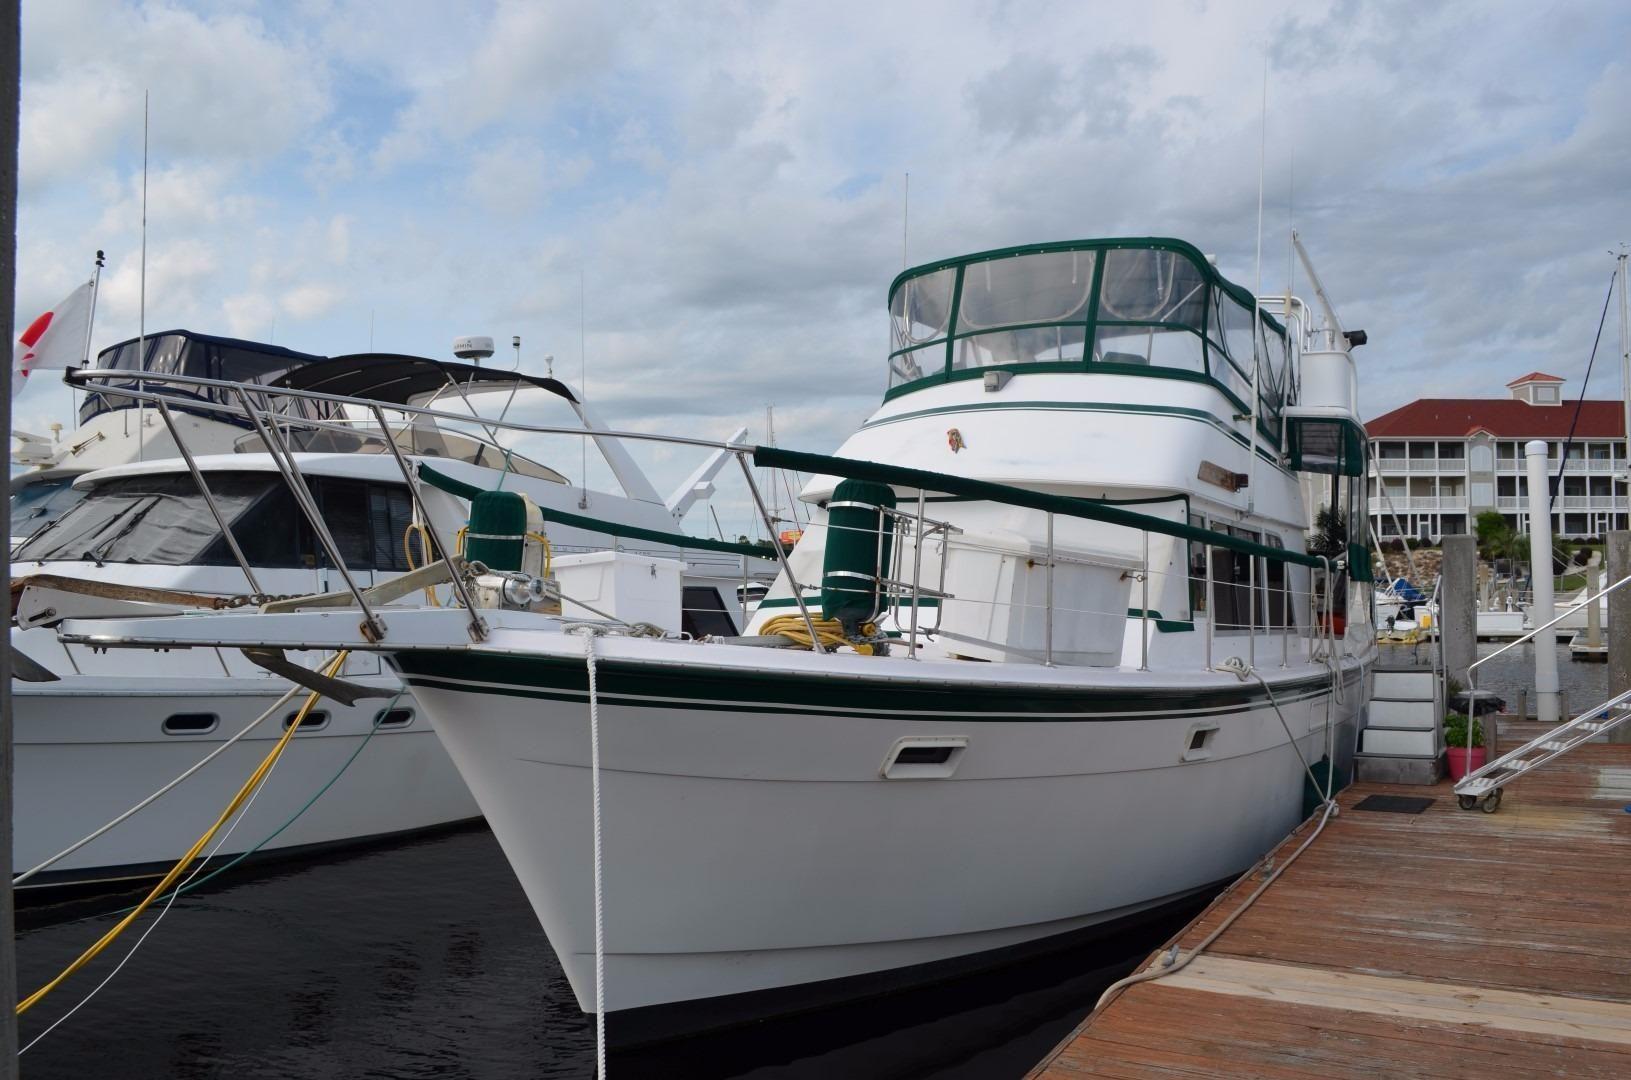 47 Atlantic Motor Vessel: 1980 Atlantic 44 Motor Yacht Power Boat For Sale